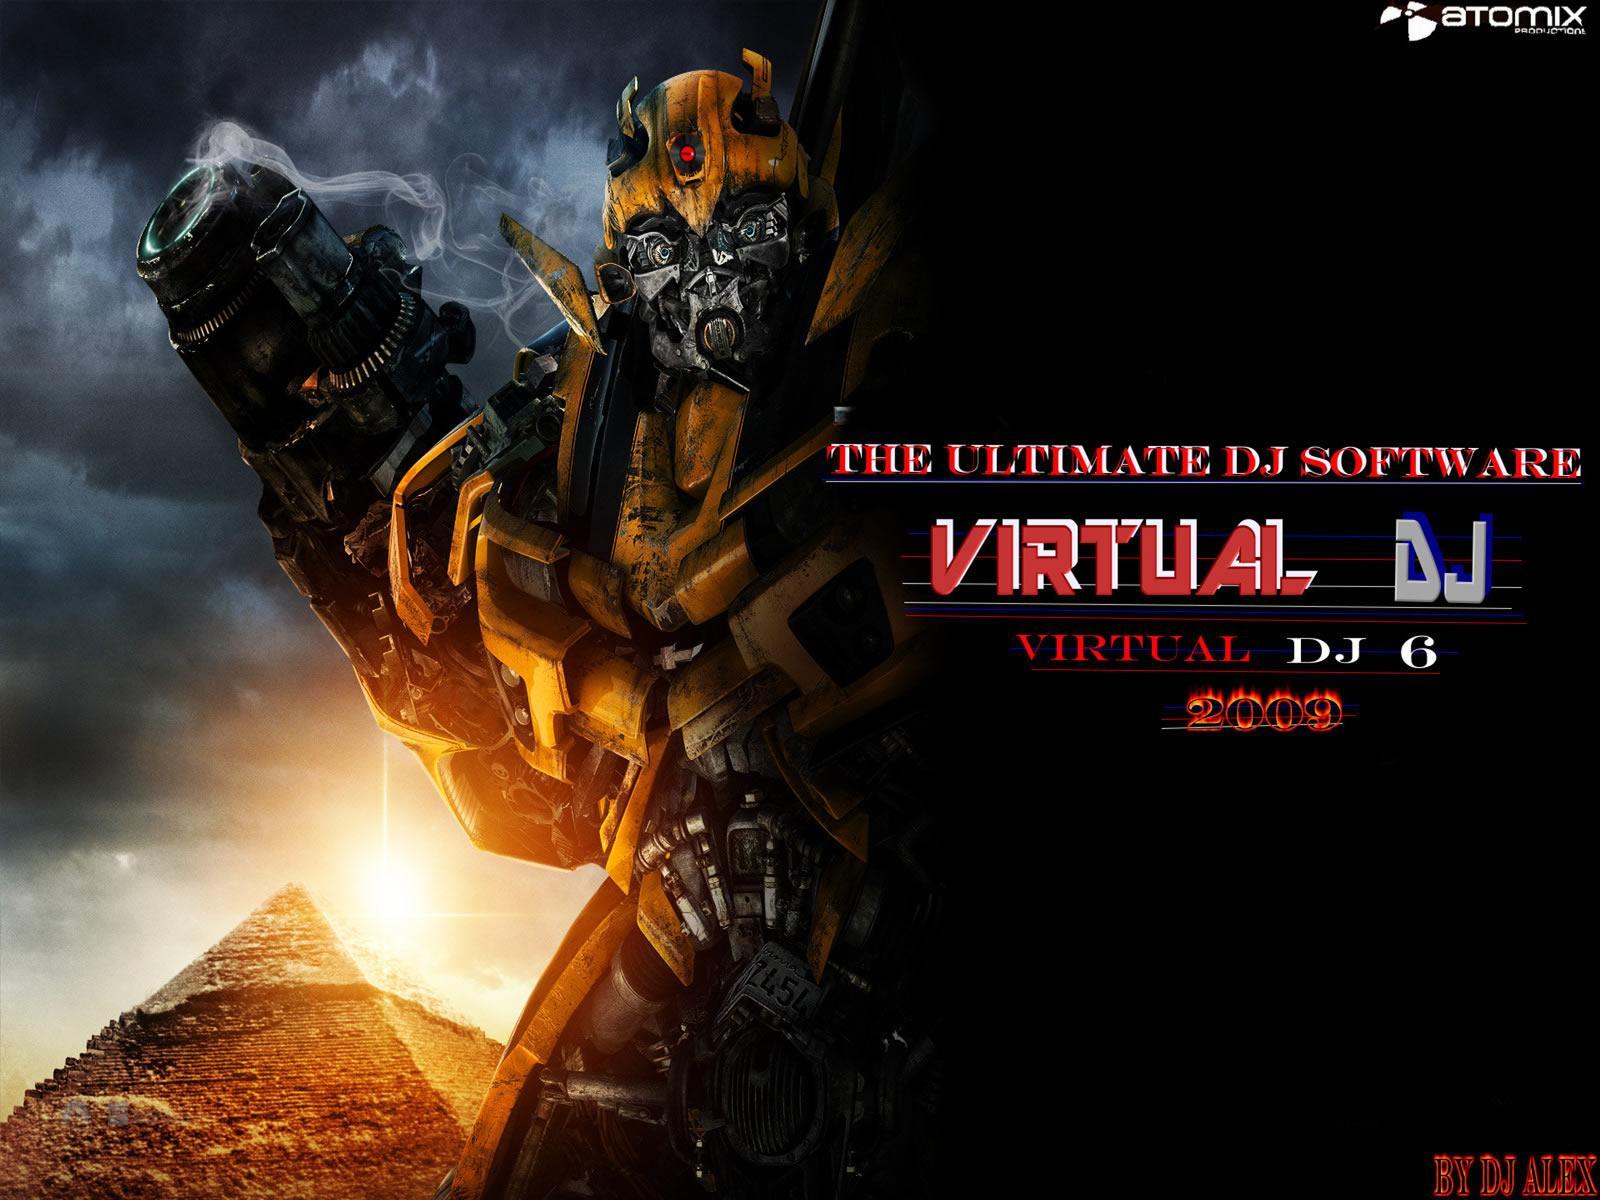 transformers virtual dj papel de parede sobre transformers virtual dj 1600x1200